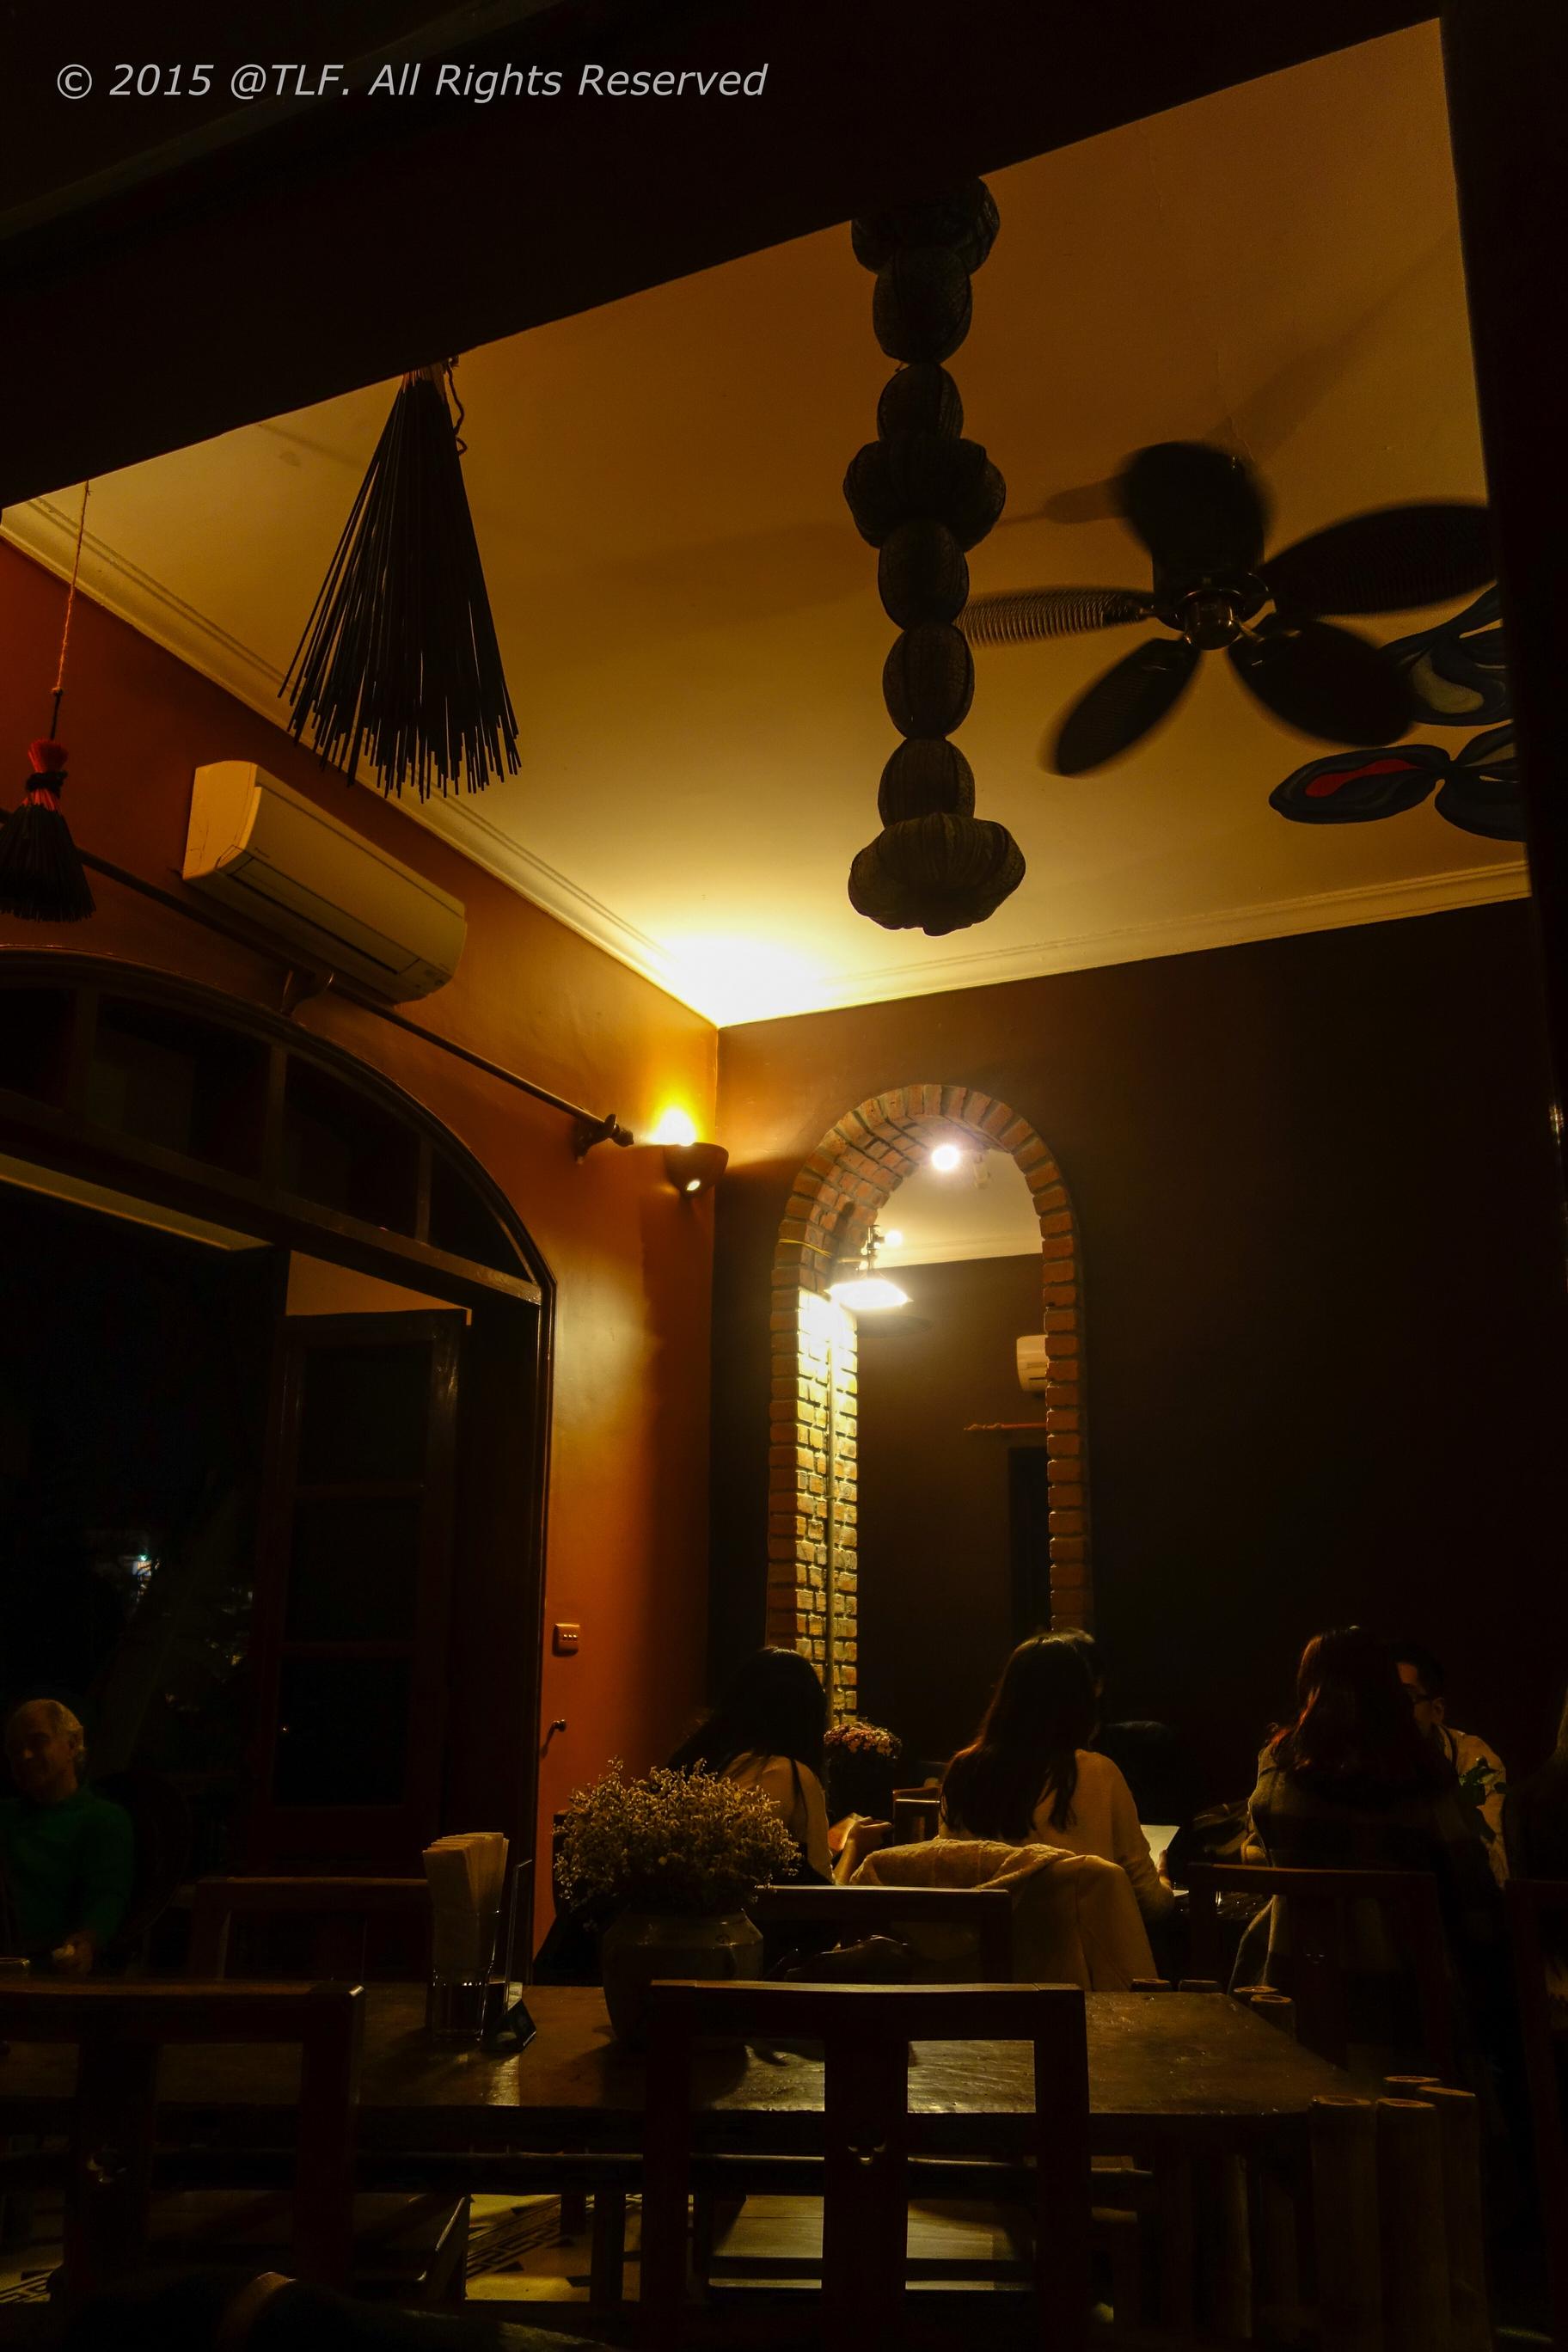 Maison de tet decor updated tho loves food for Decor maison